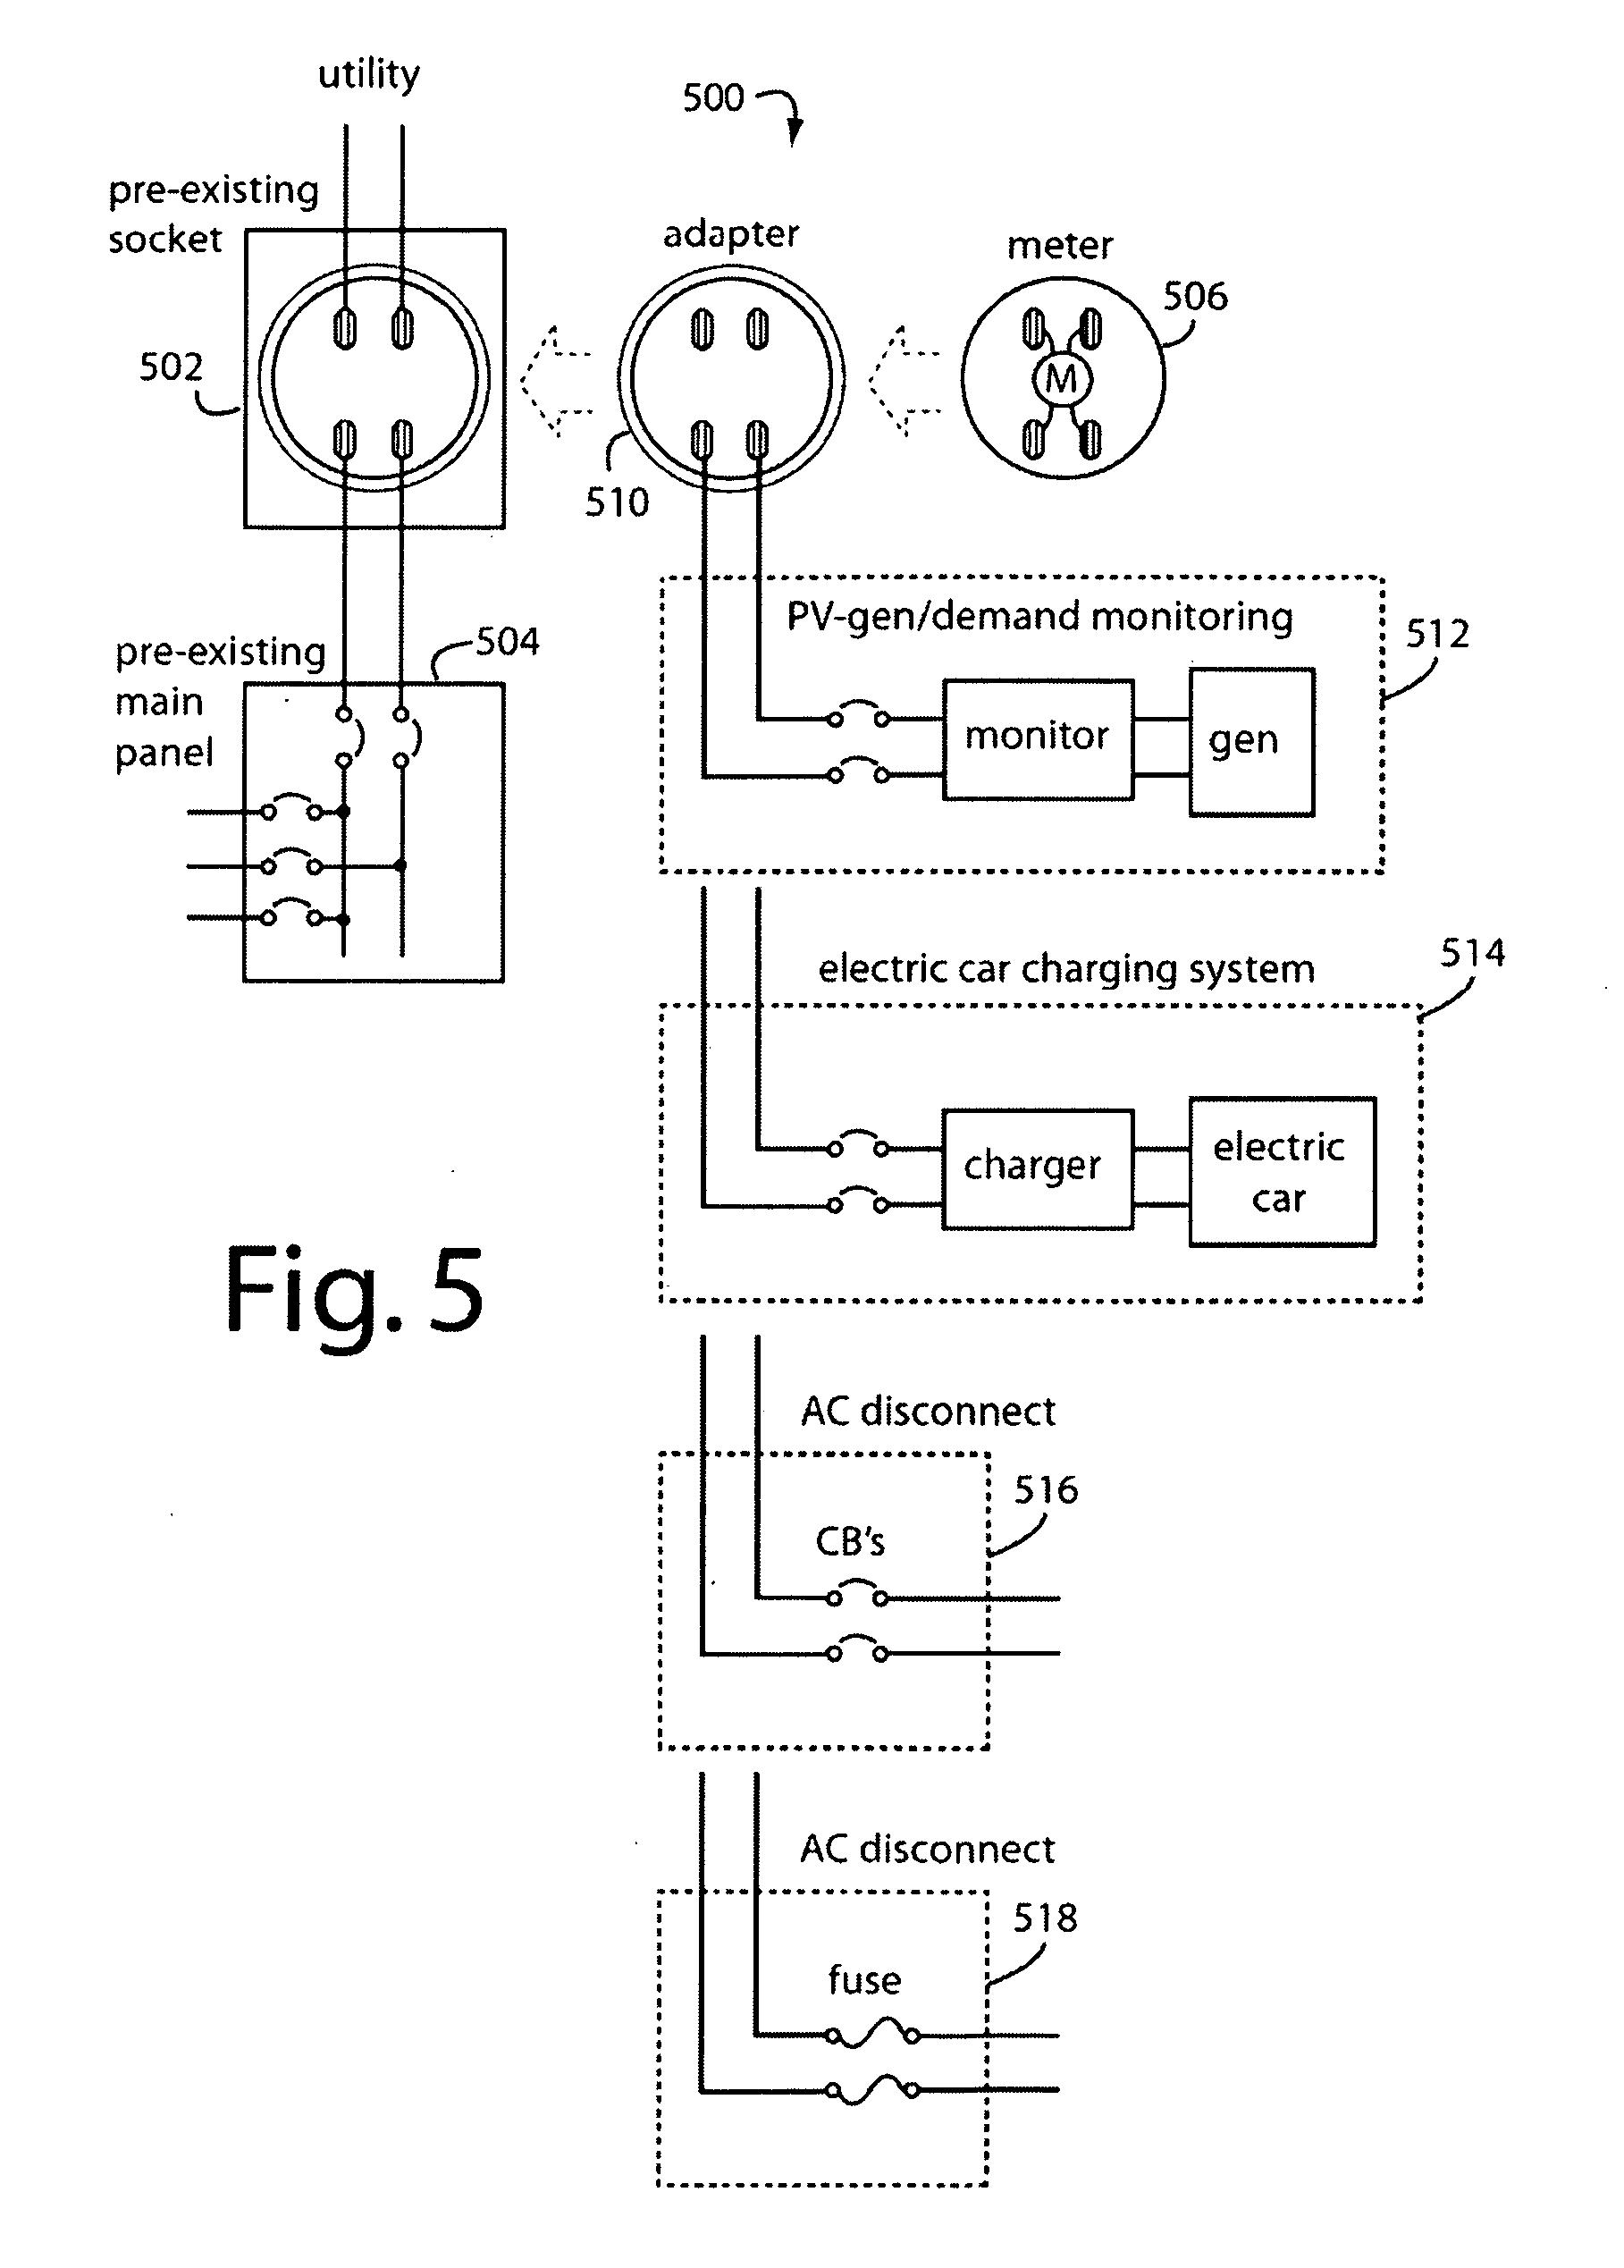 watt hour meter wiring diagram 1998 chevy s10 radio 9s water heater